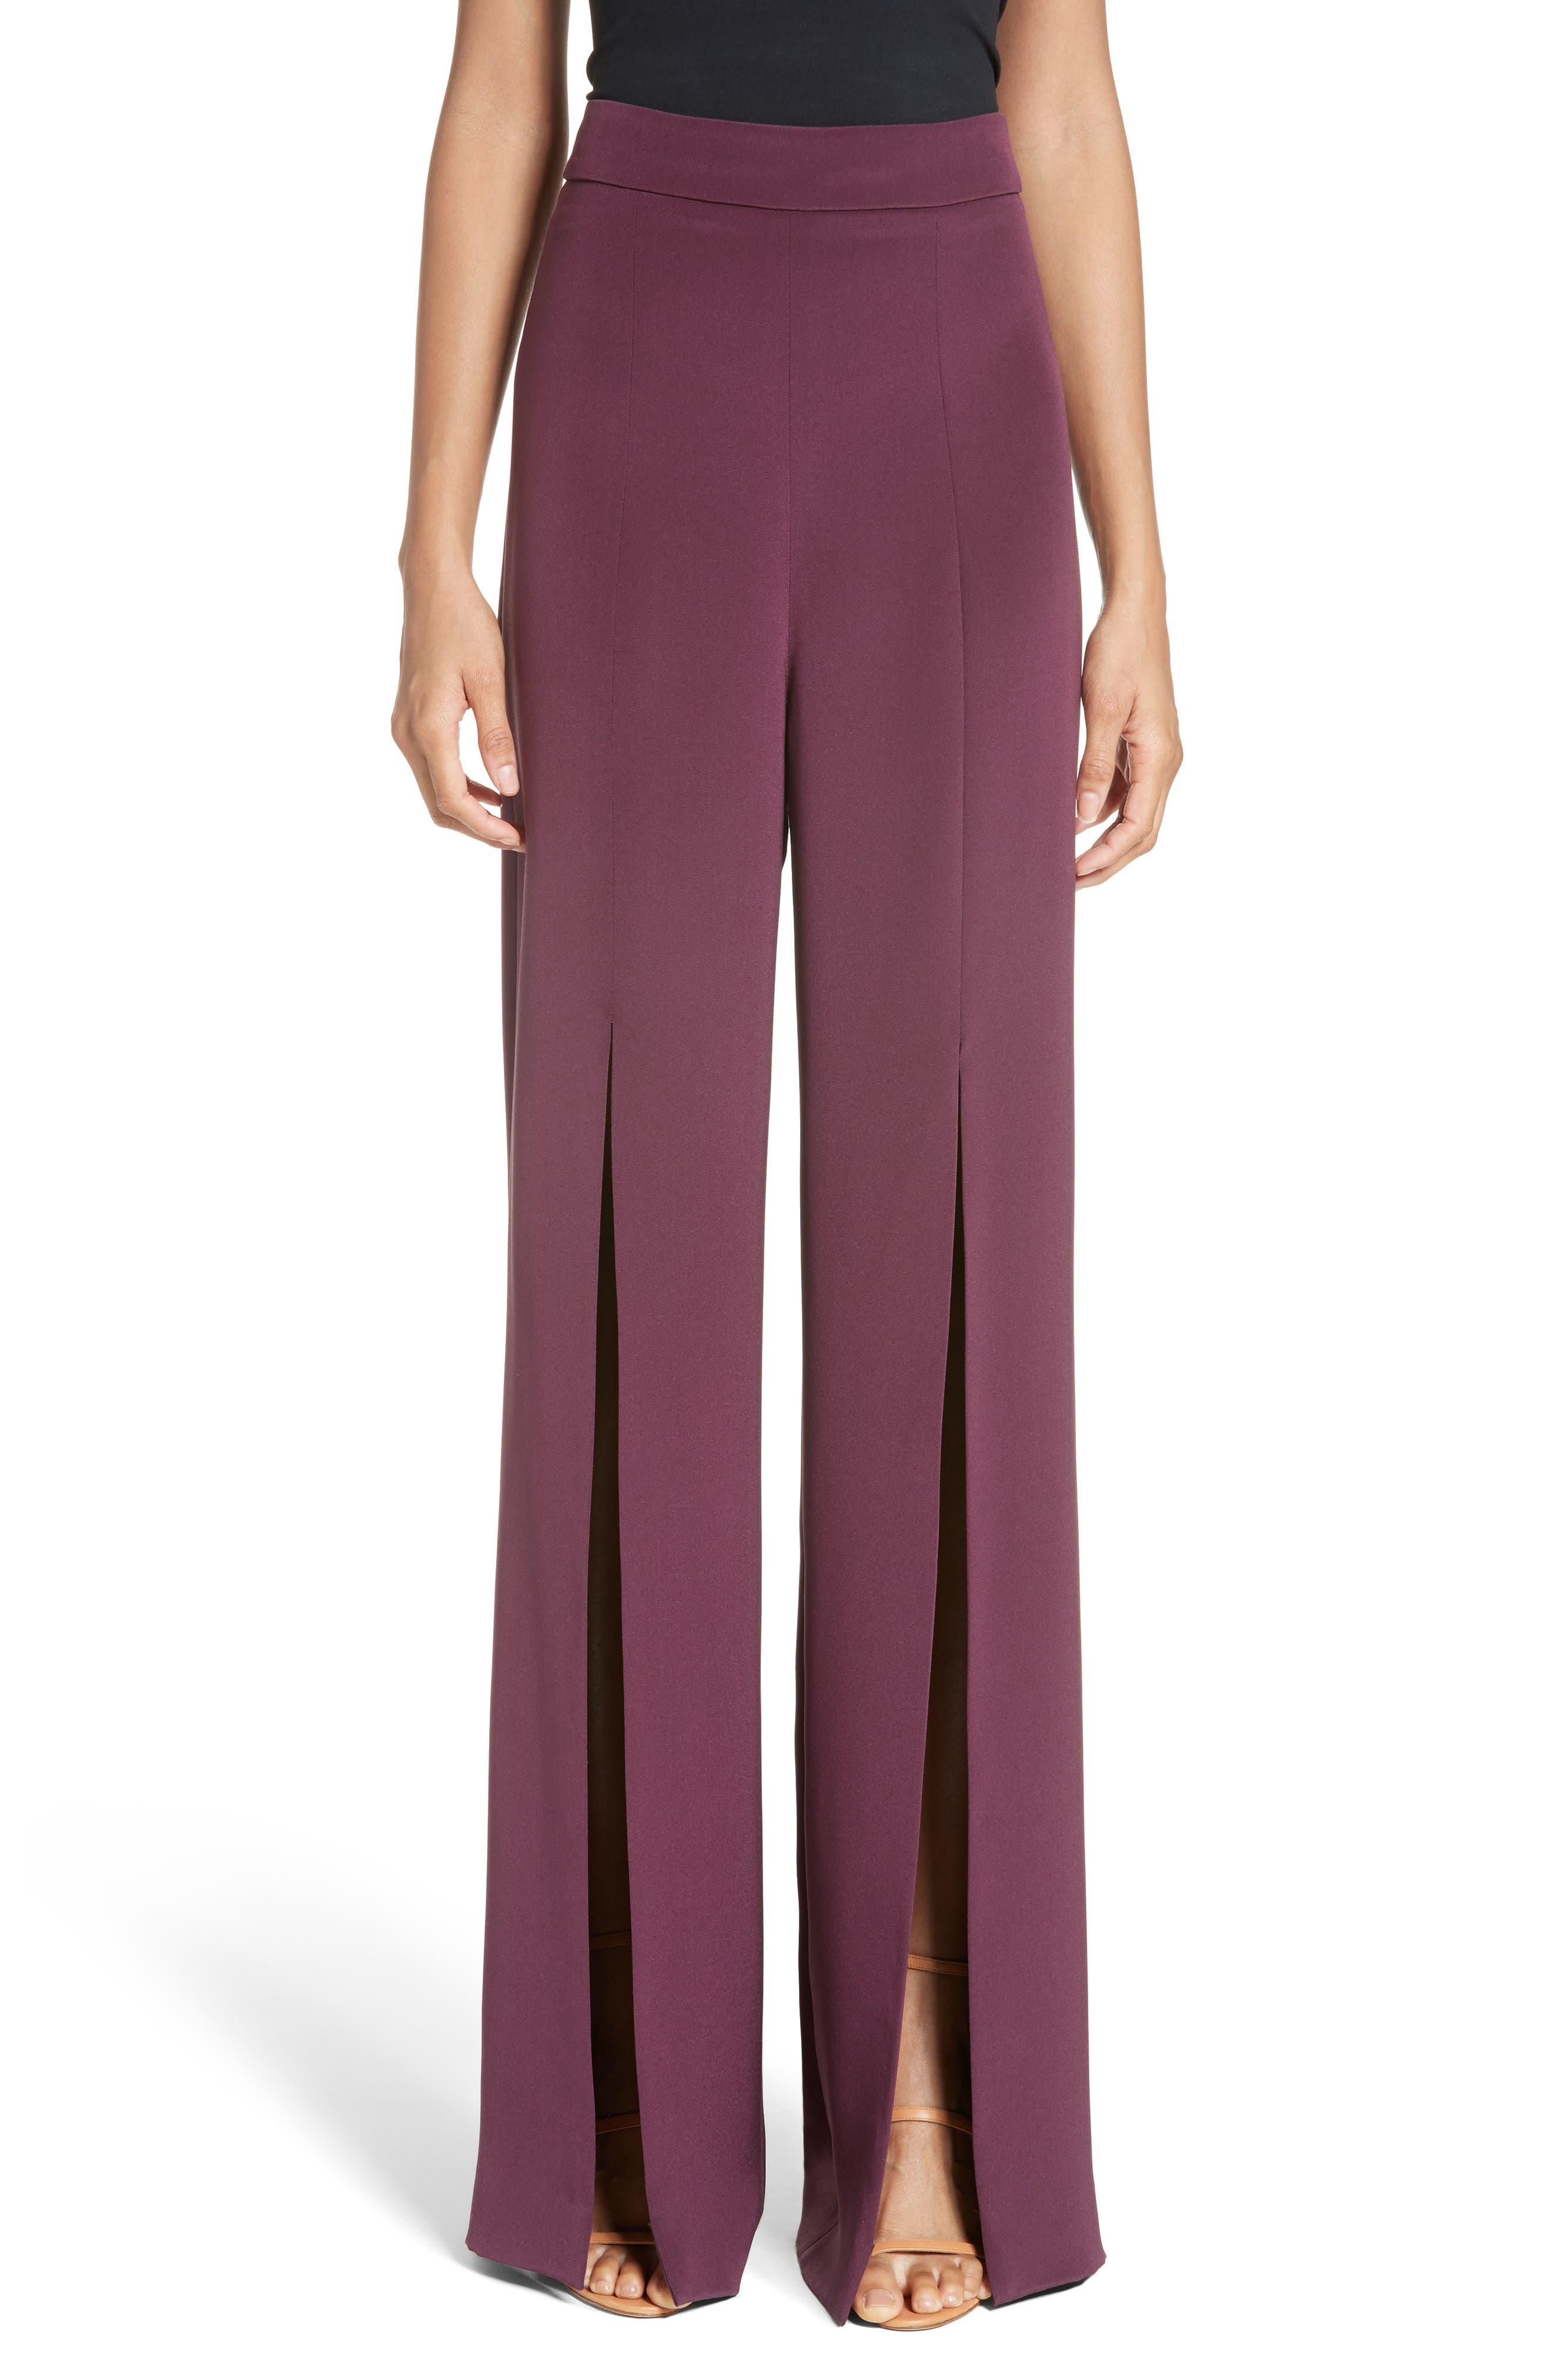 Cushnie et Ochs Slit Silk High Waisted Pants